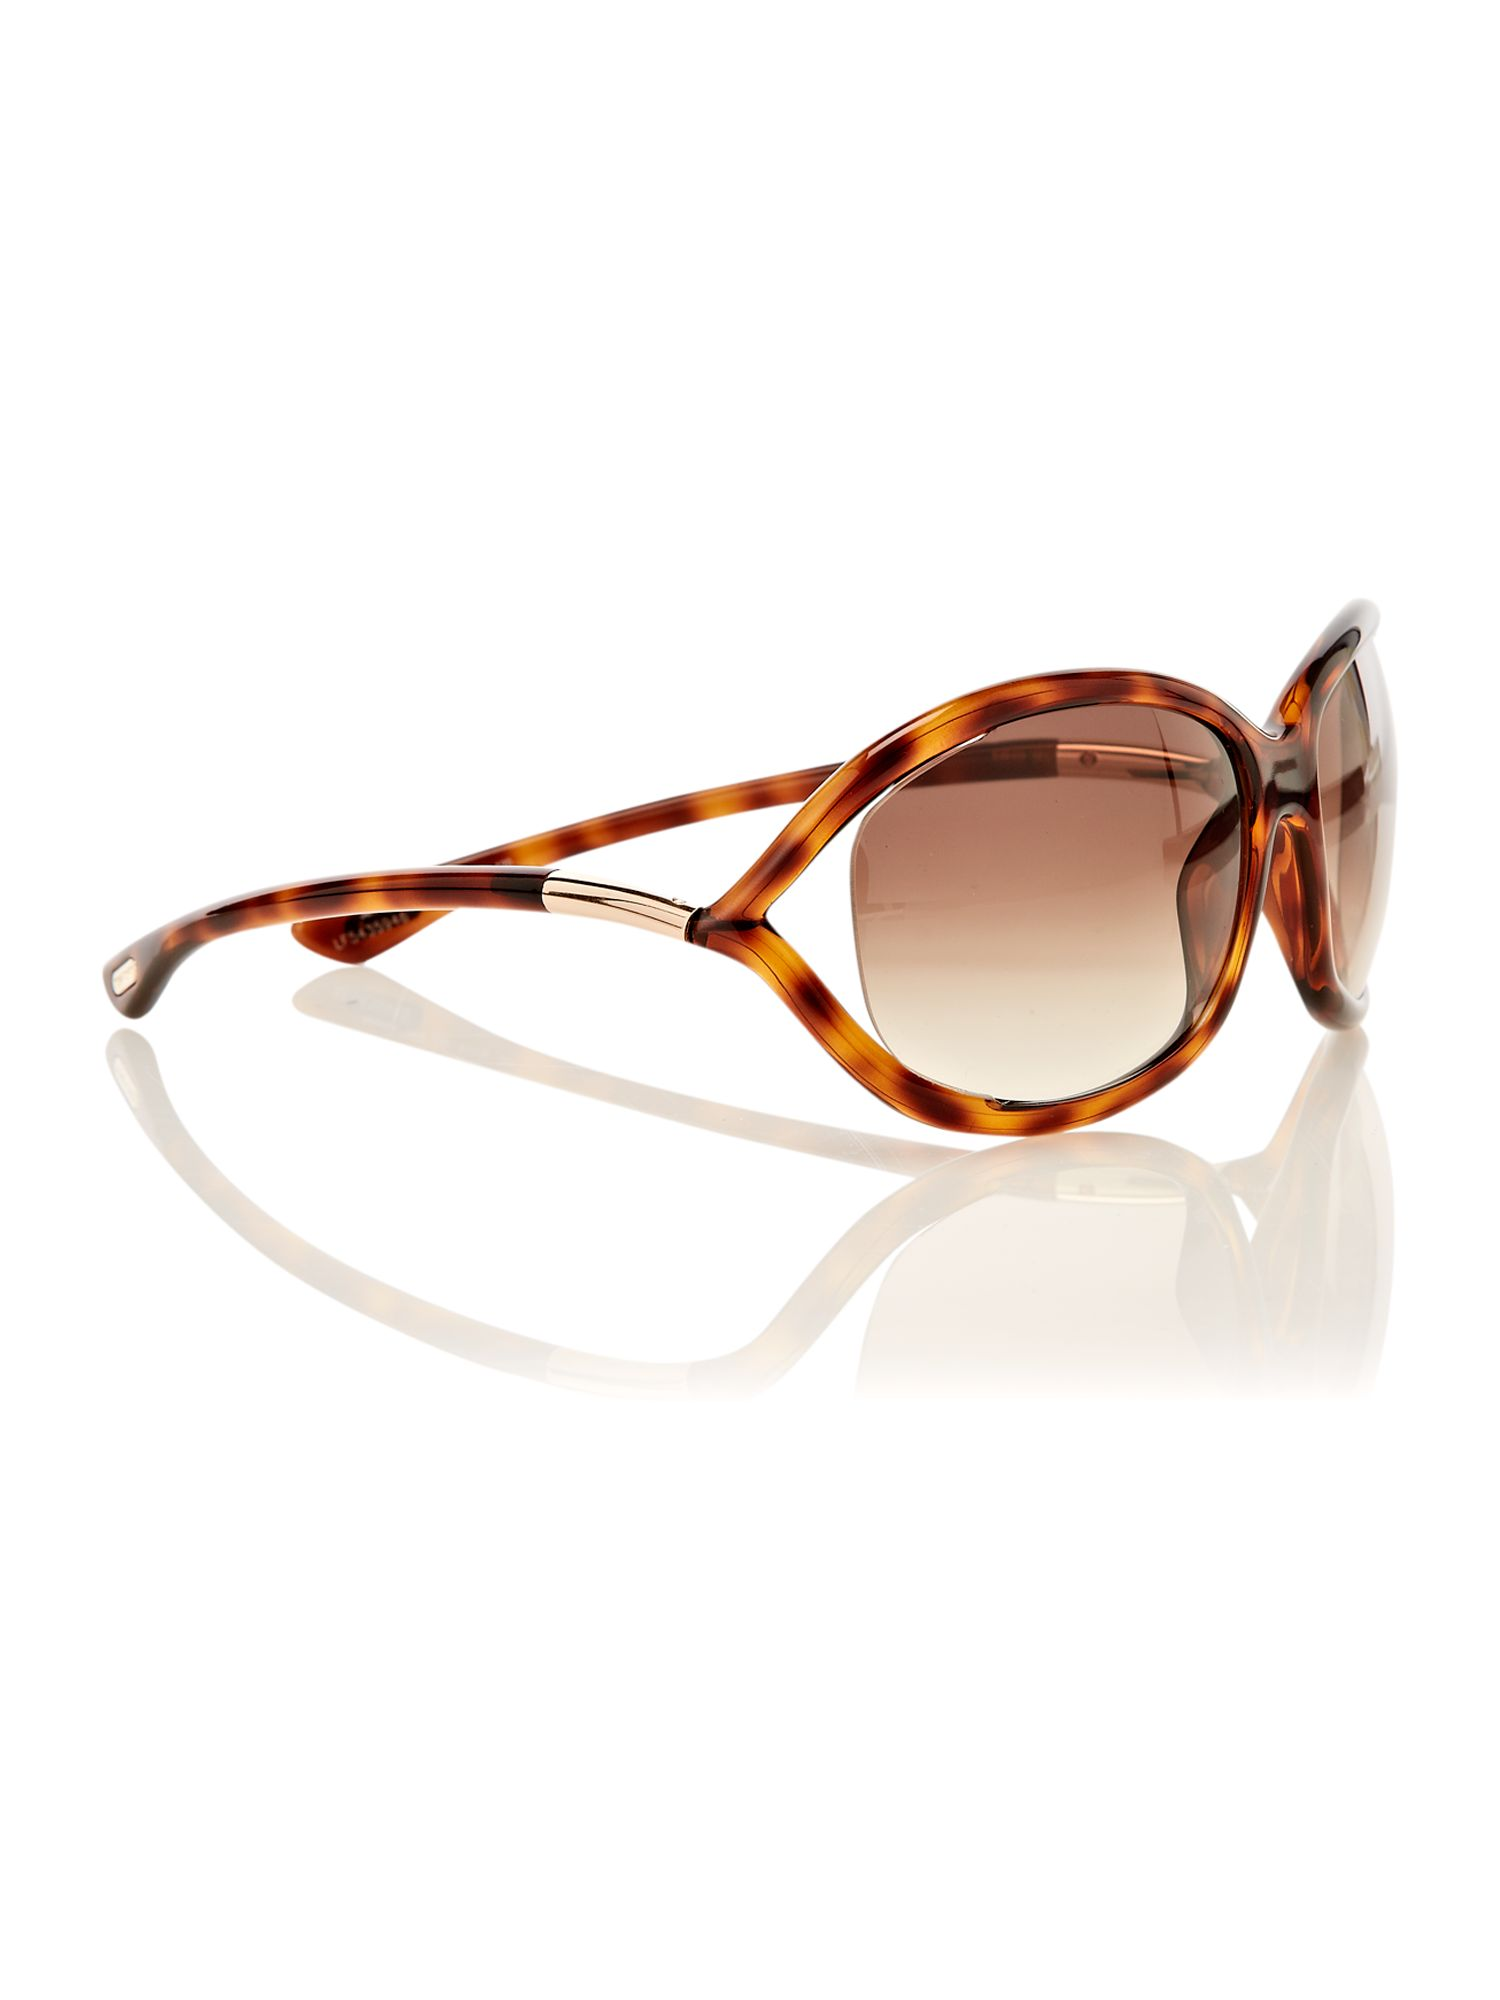 3864880d24214 Tom Ford Eyewear Jennifer Polarized Sunglasses « Heritage Malta